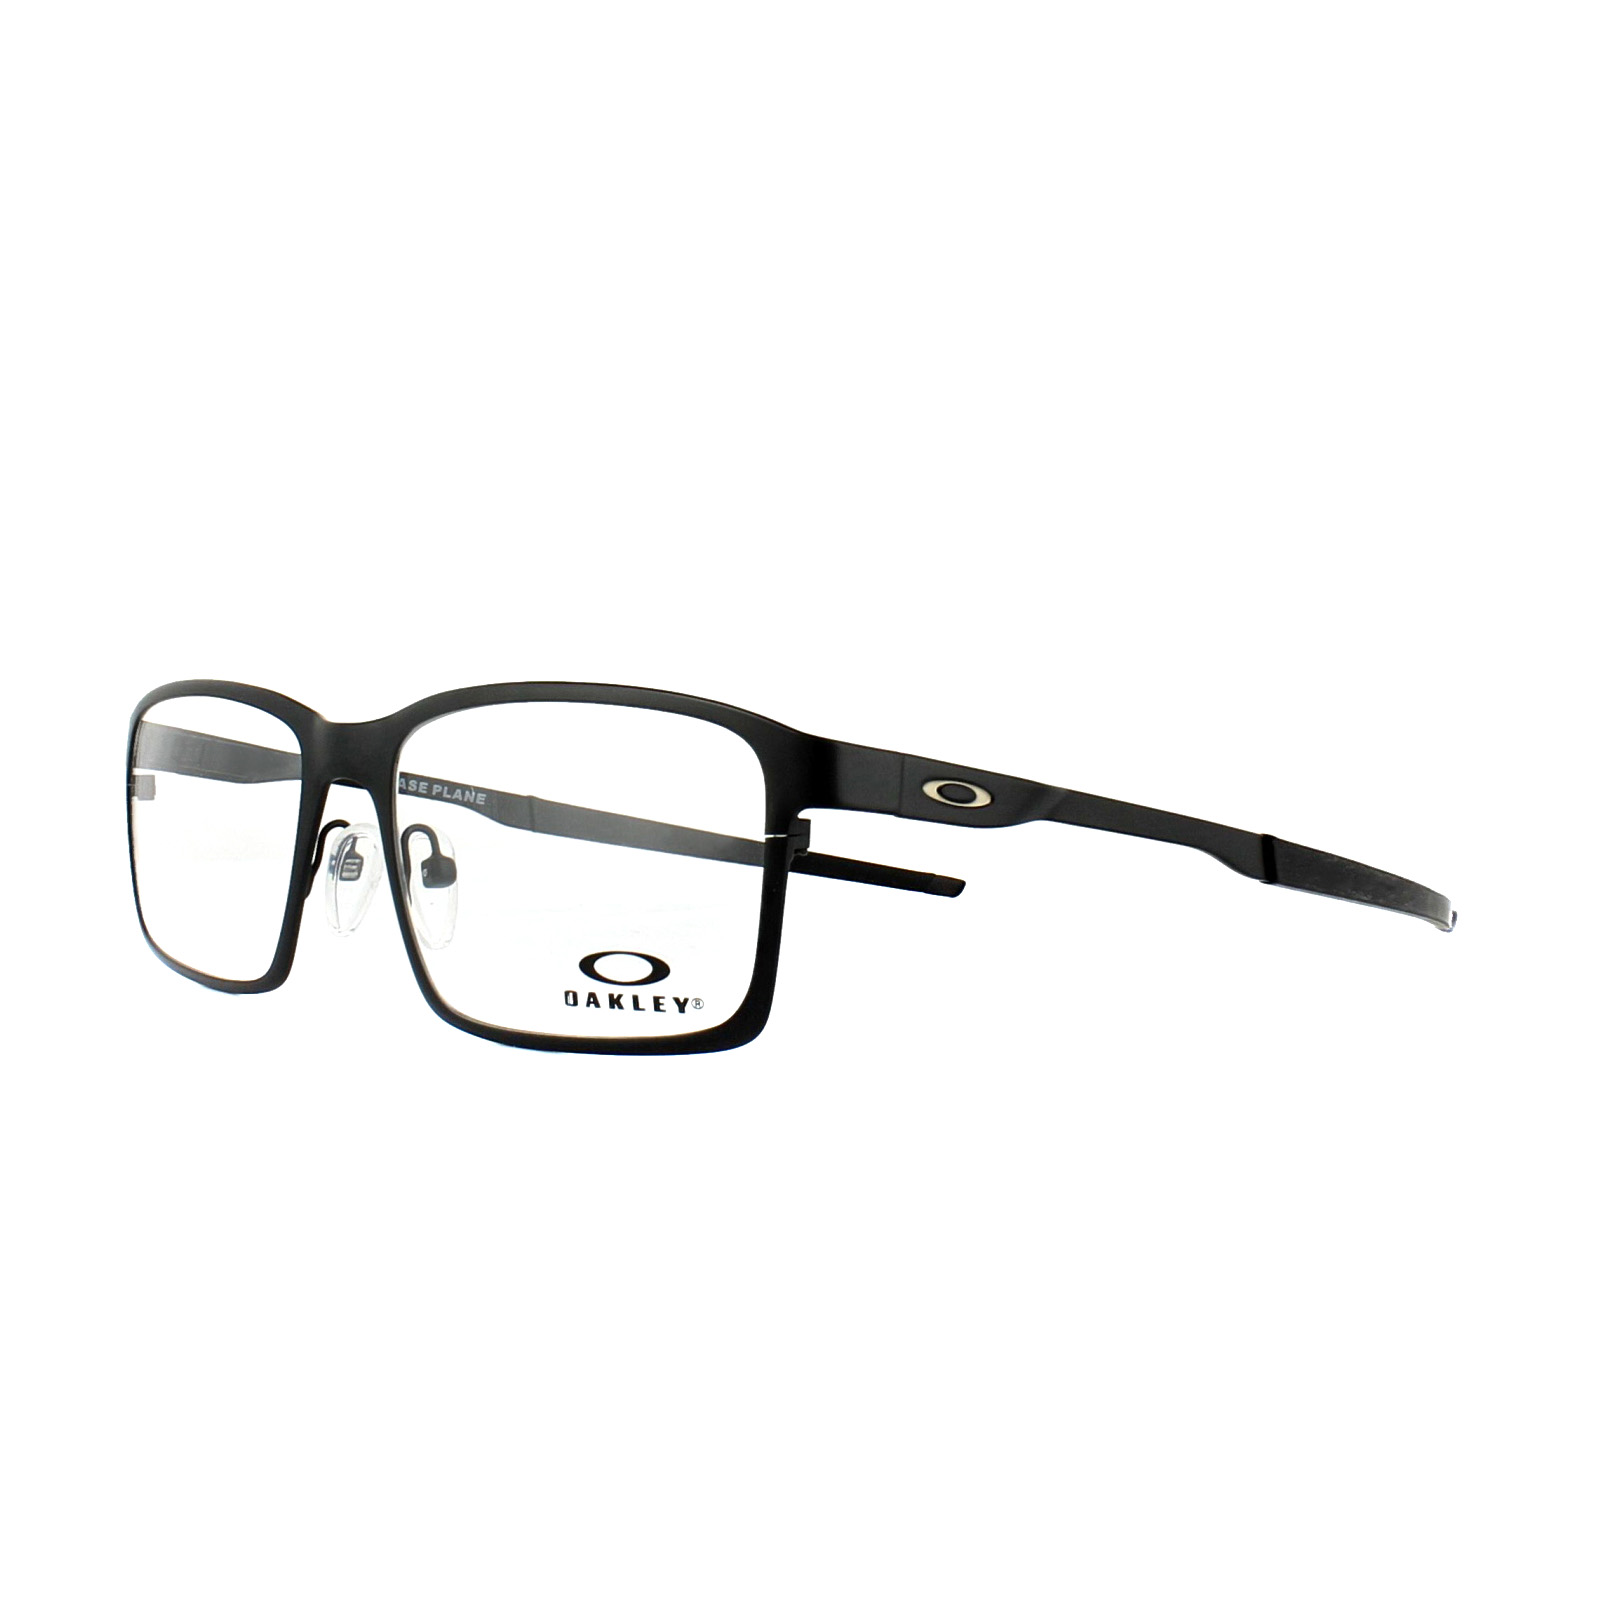 228093e59d Sentinel Oakley Glasses Frames Base Plane OX3232-01 Satin Black 54mm Mens